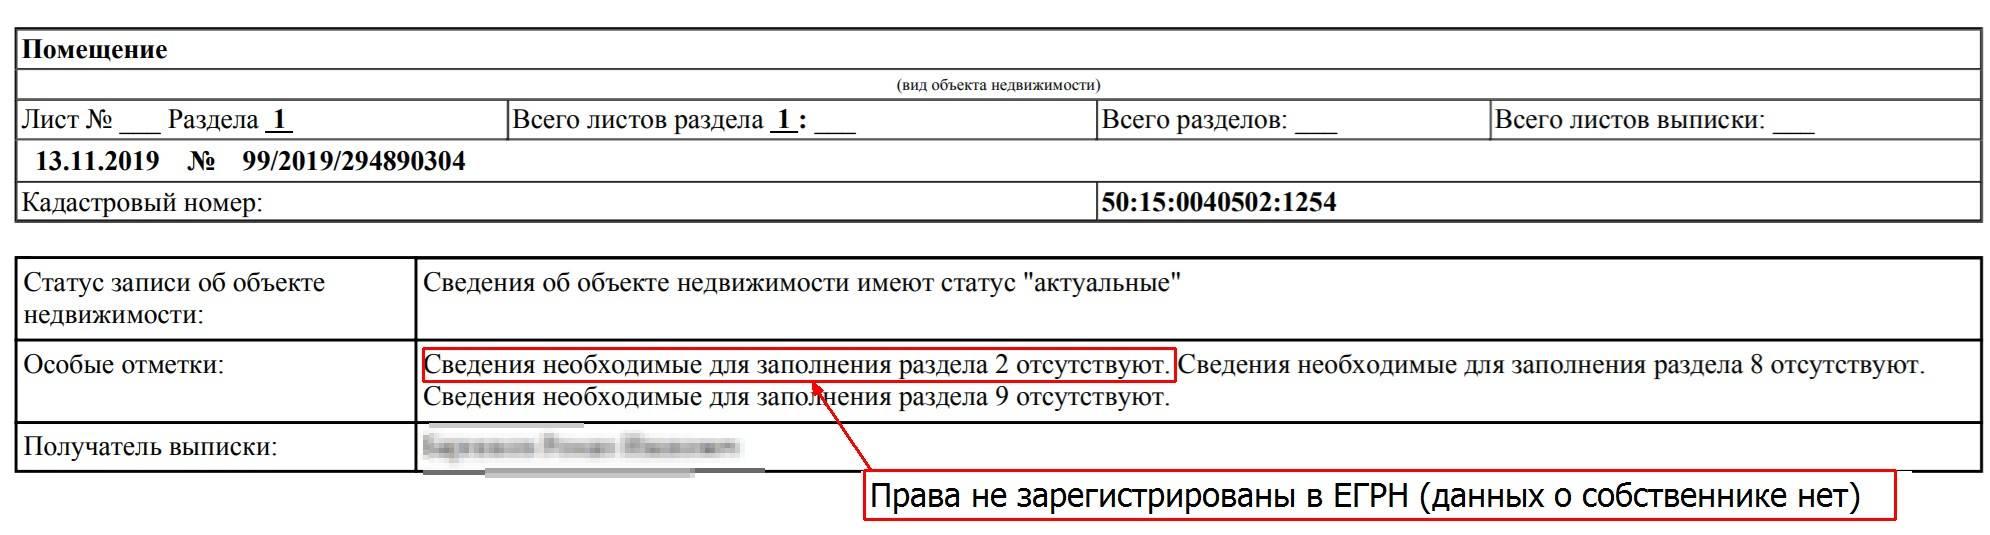 Pkk5 rosreestr ru - публичная кадастровая карта онлайн